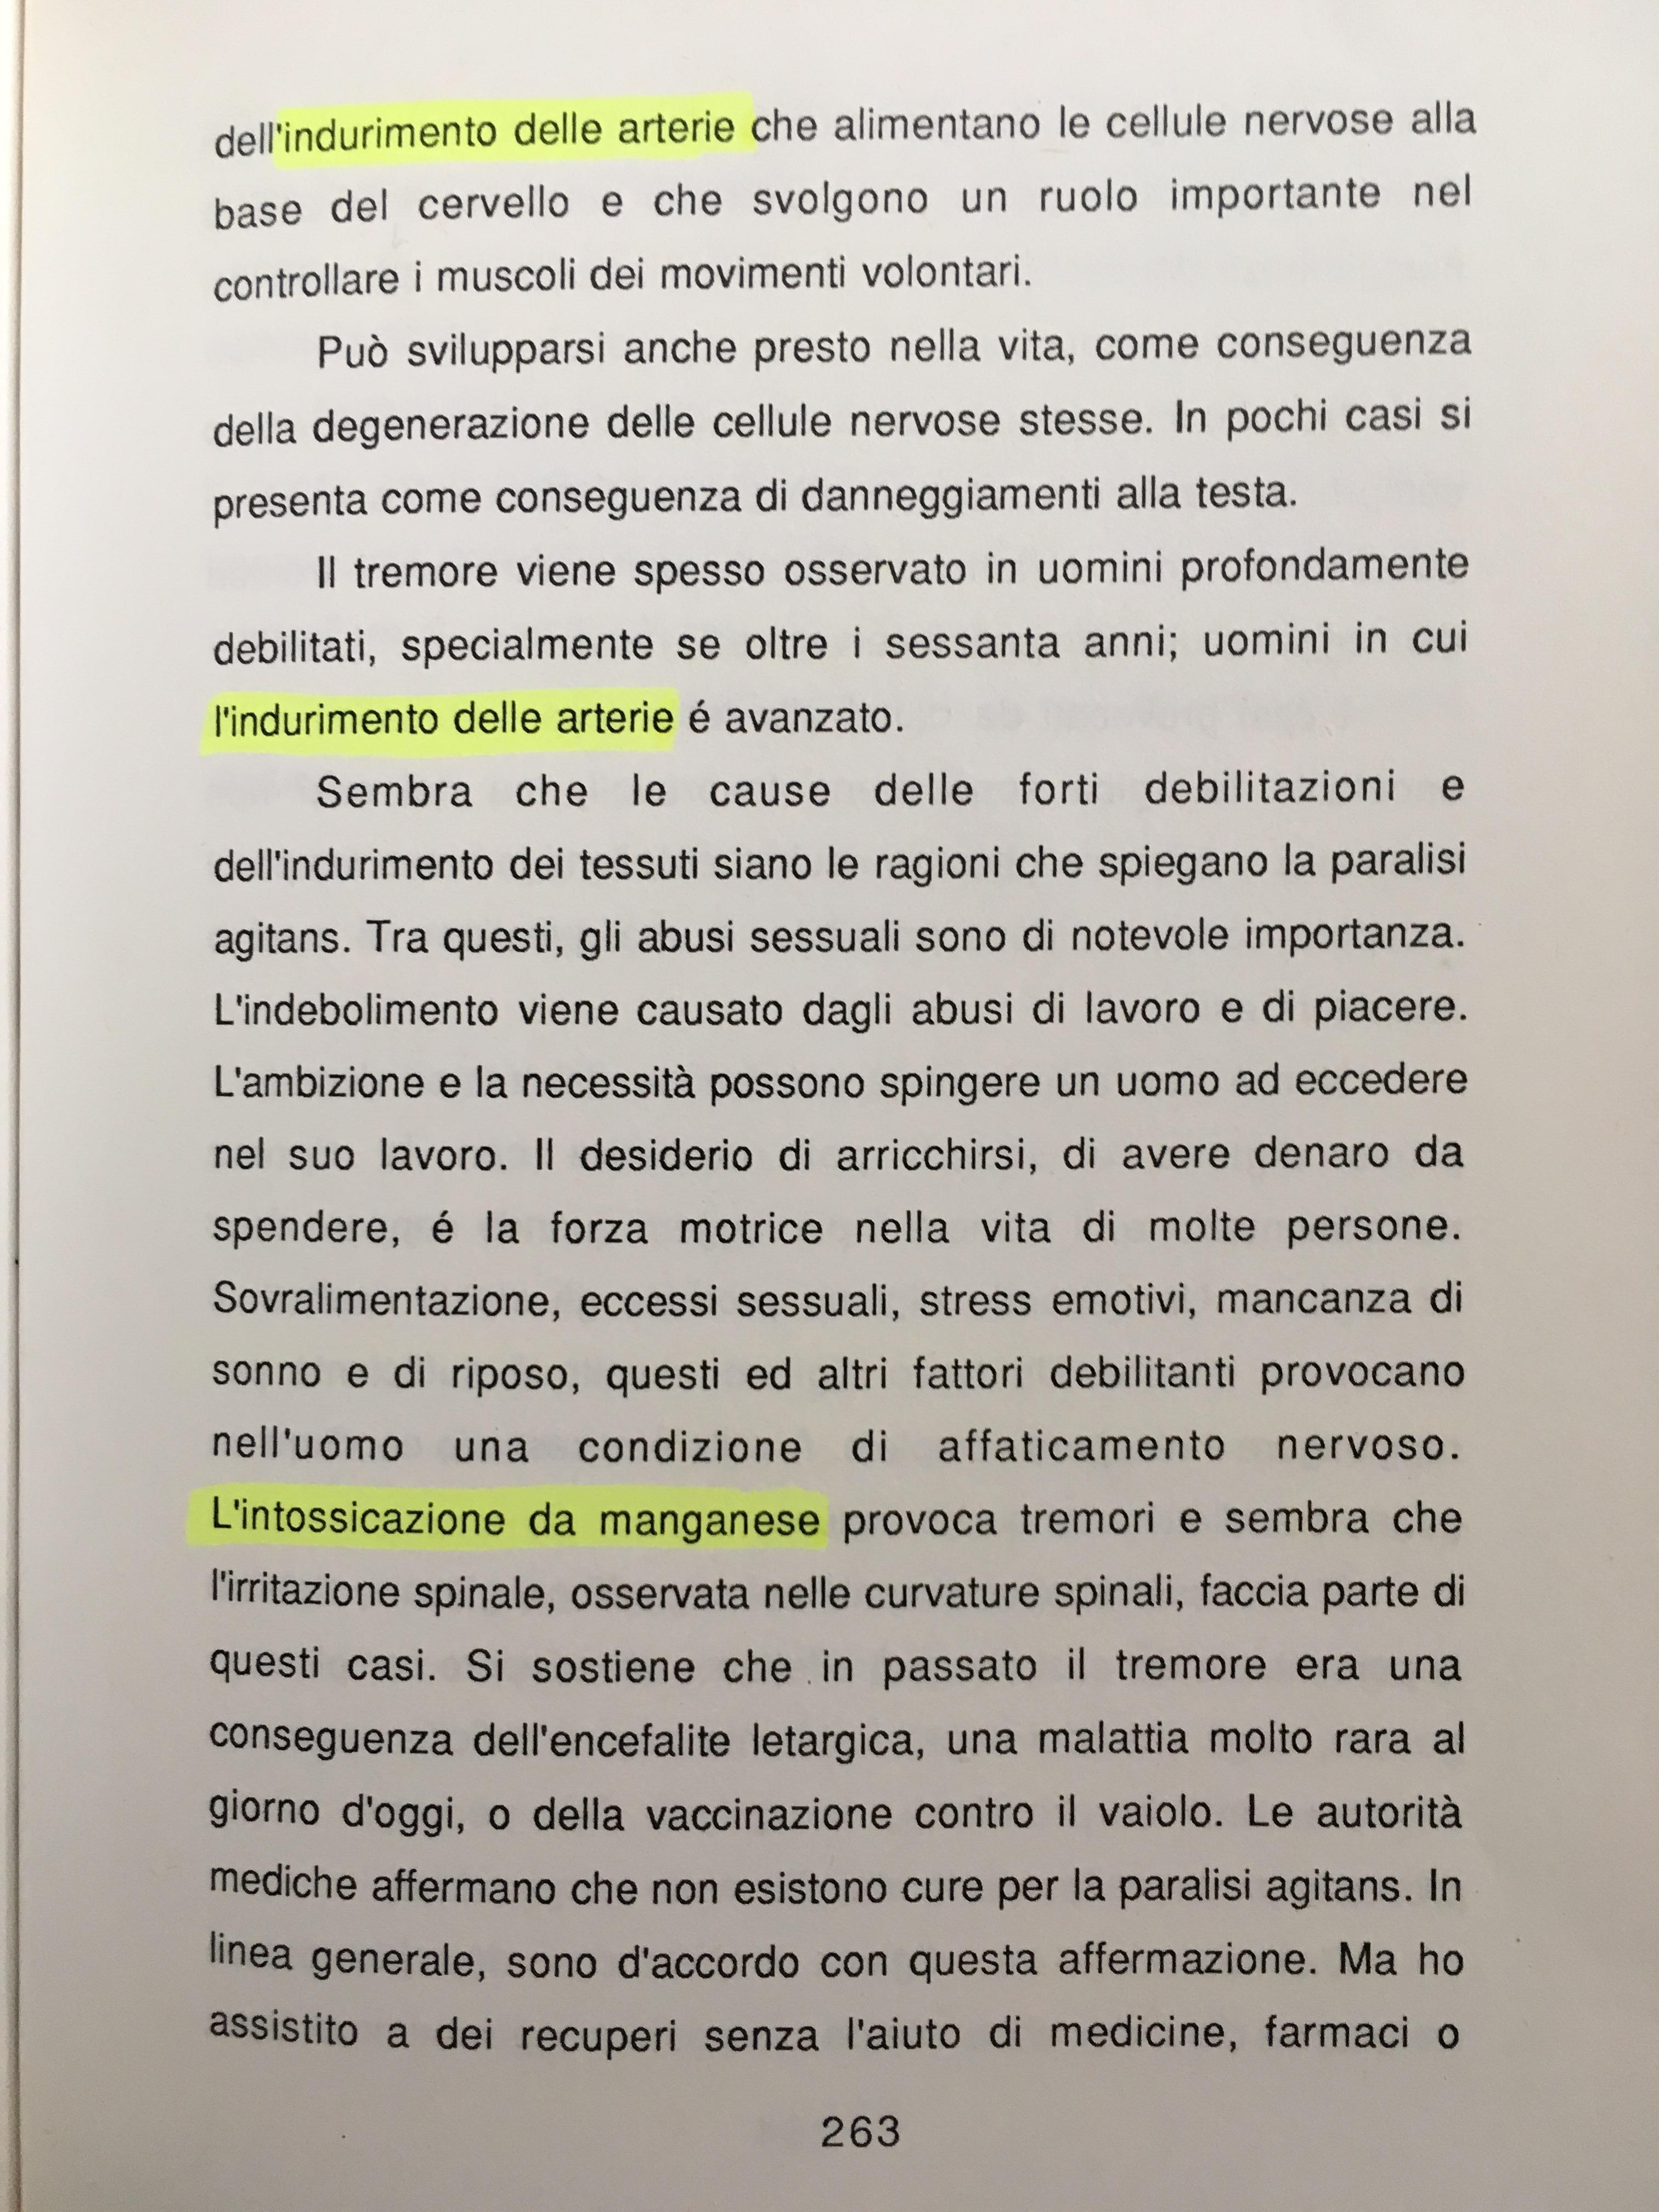 p 263